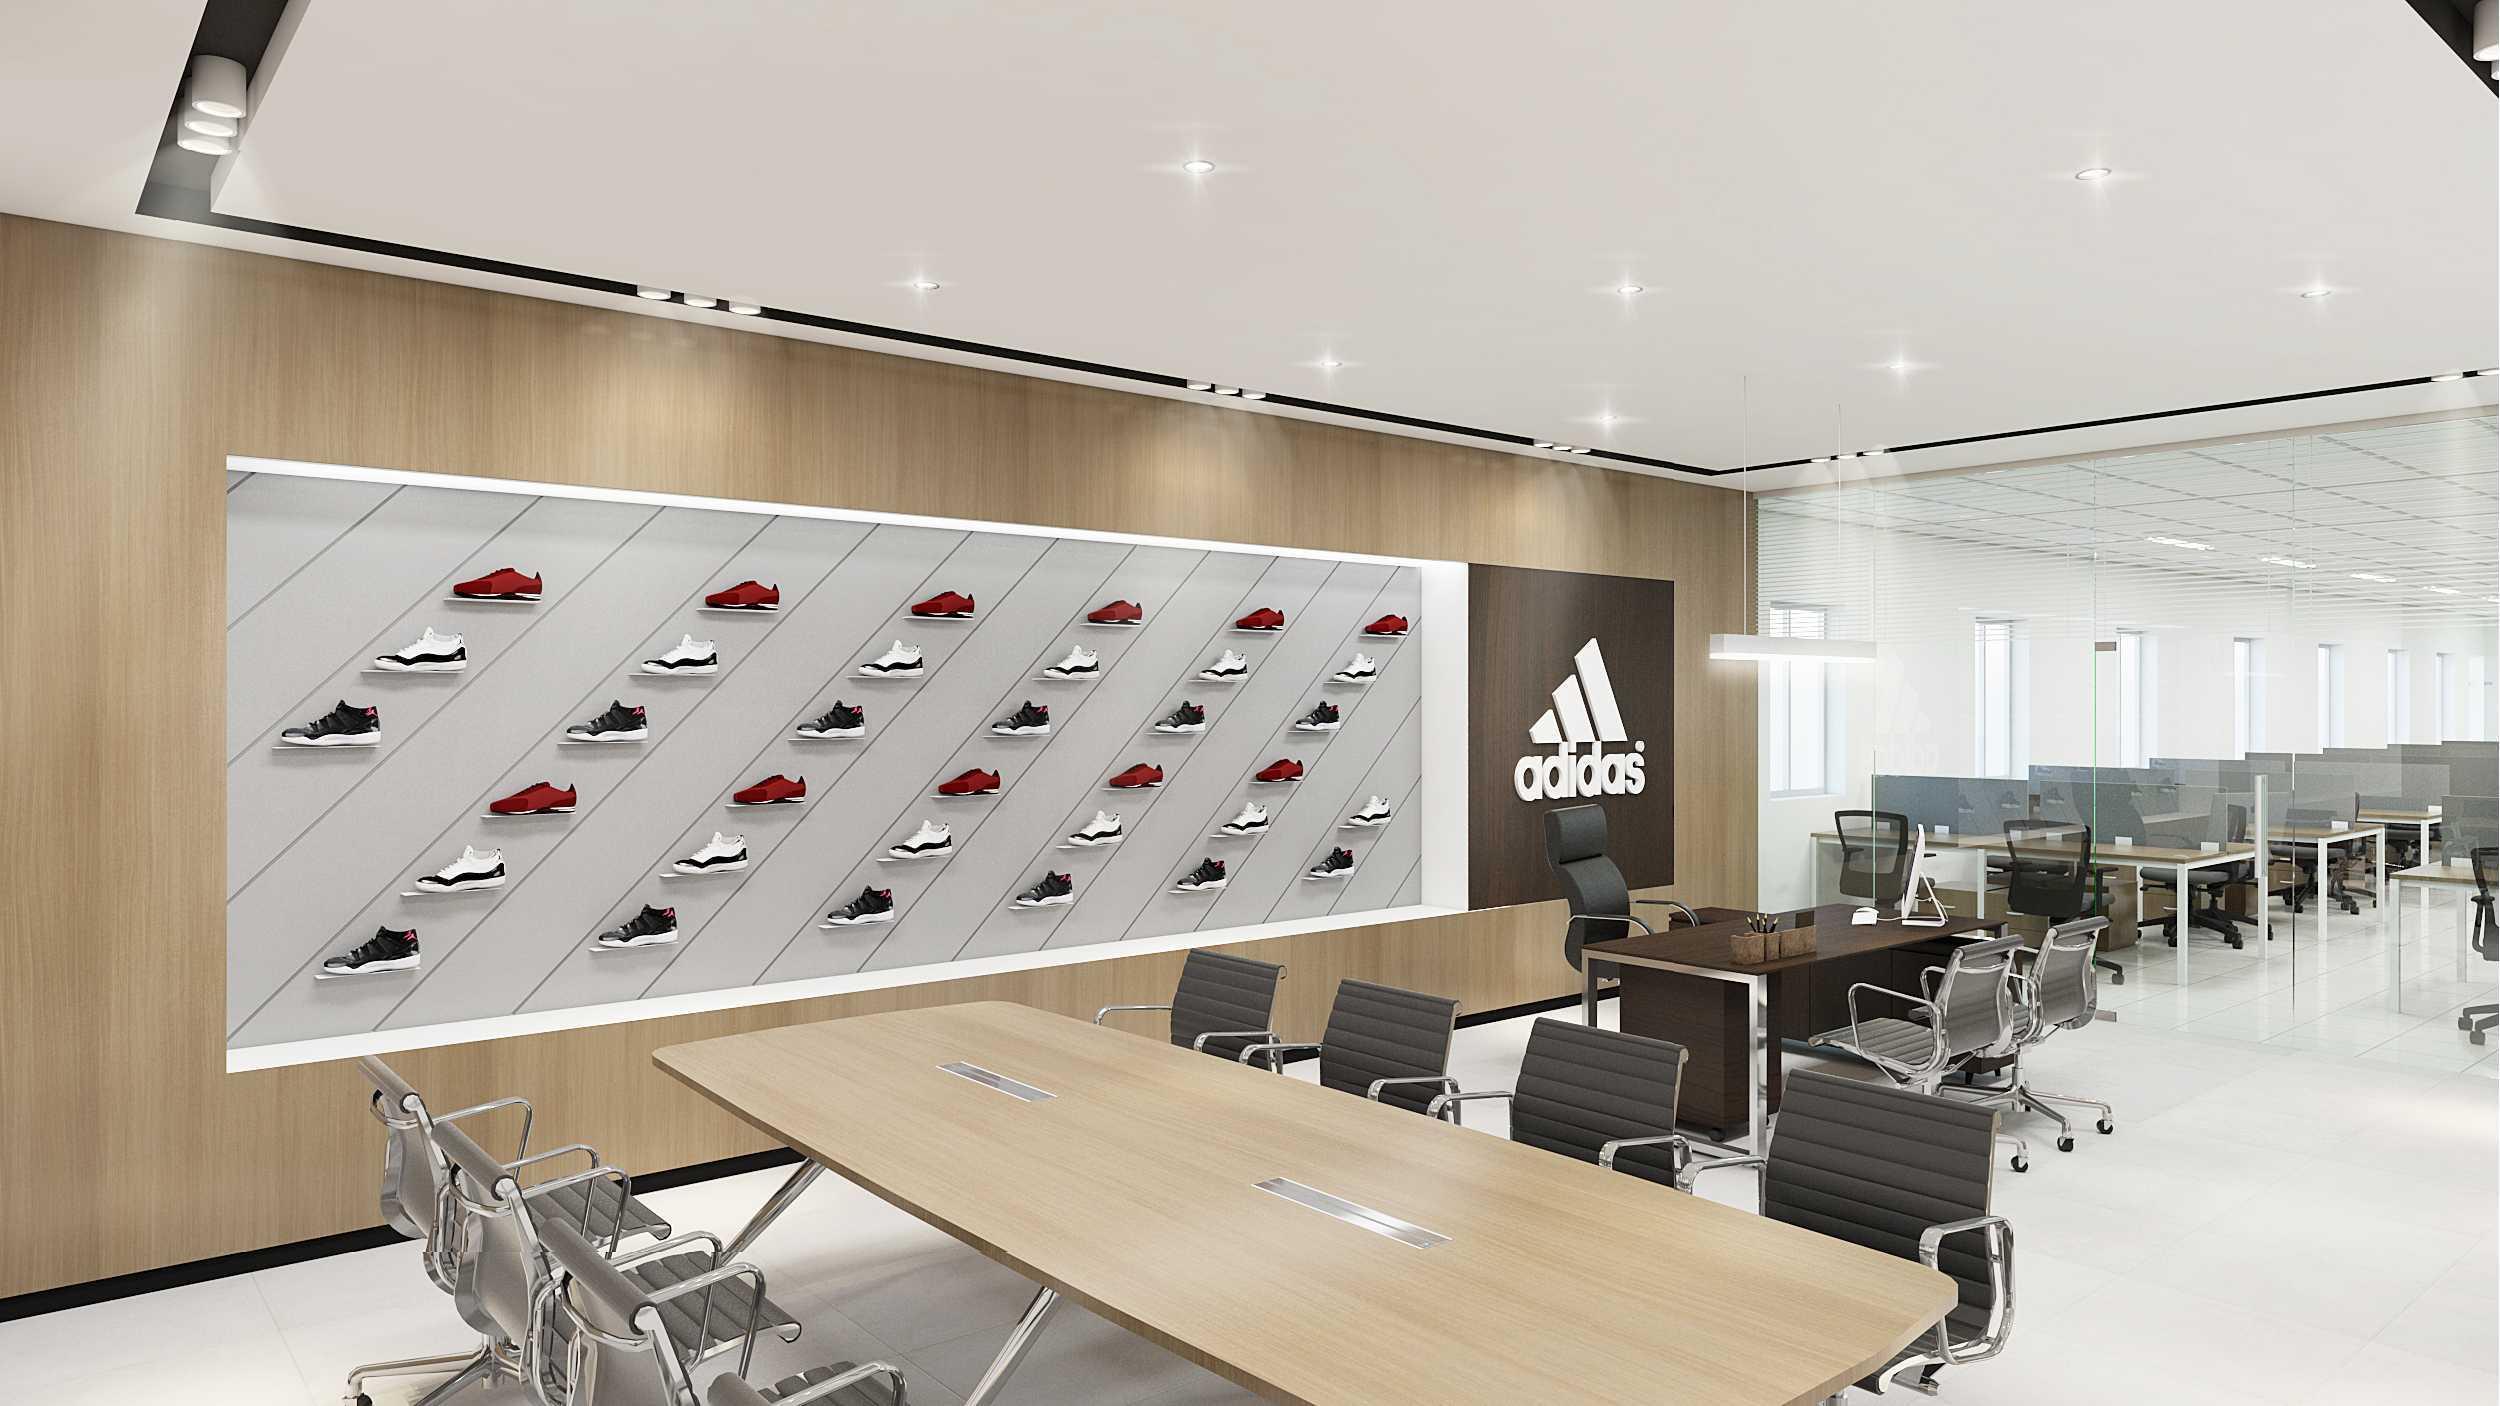 Atelier Vasturuang Adidas Factory Serang, Kec. Serang, Kota Serang, Banten, Indonesia Serang, Kec. Serang, Kota Serang, Banten, Indonesia Jari-Vogest-Desain-Interior-Kantor   78155